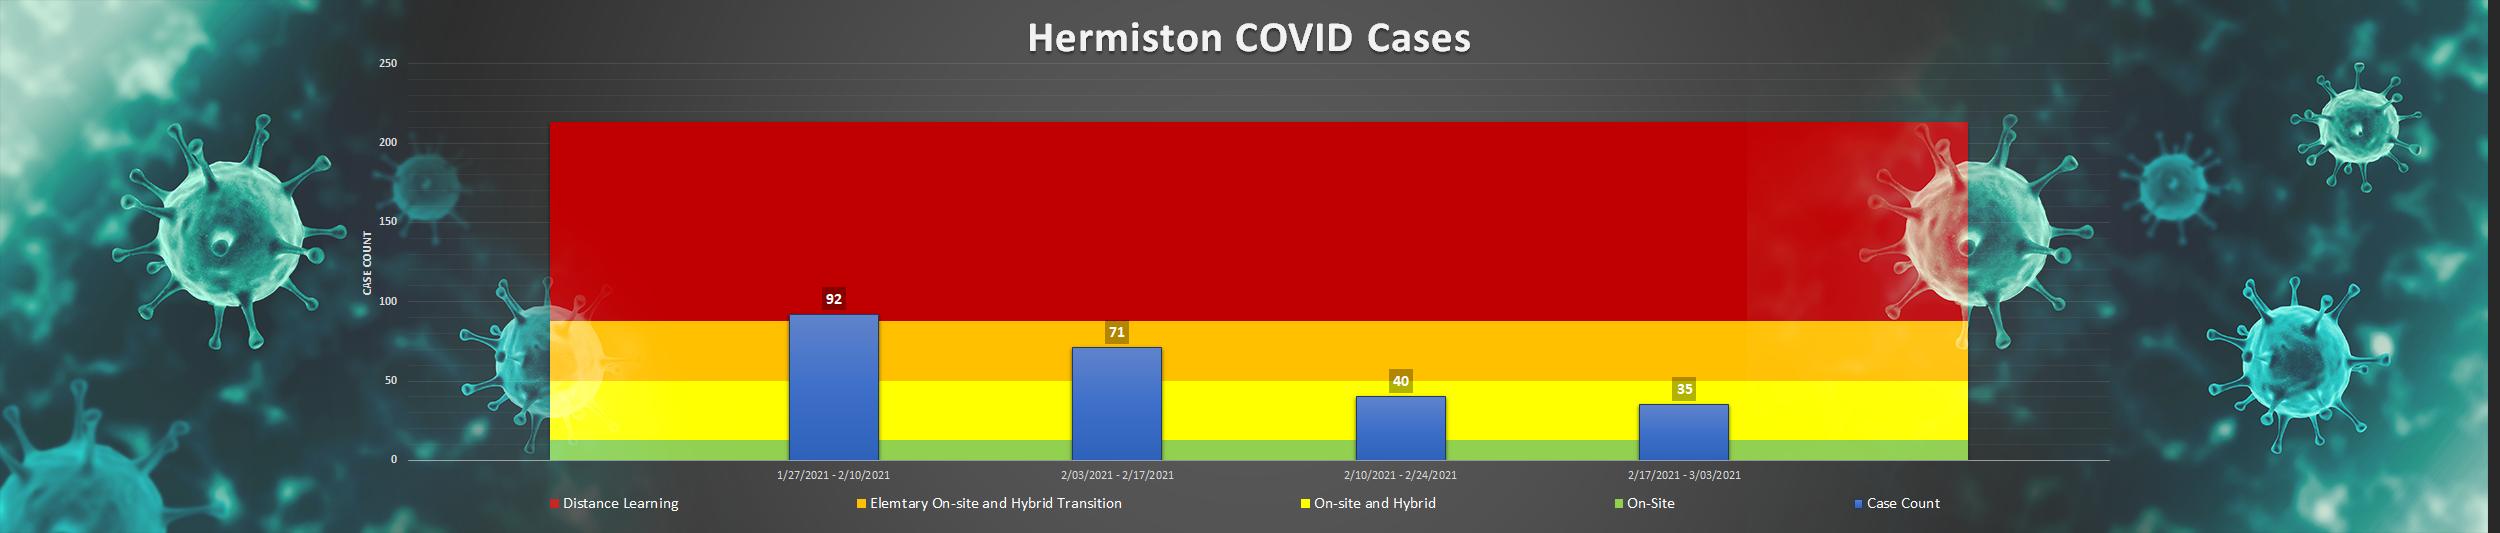 Bar graph of COVID Cases in Hermiston School District.